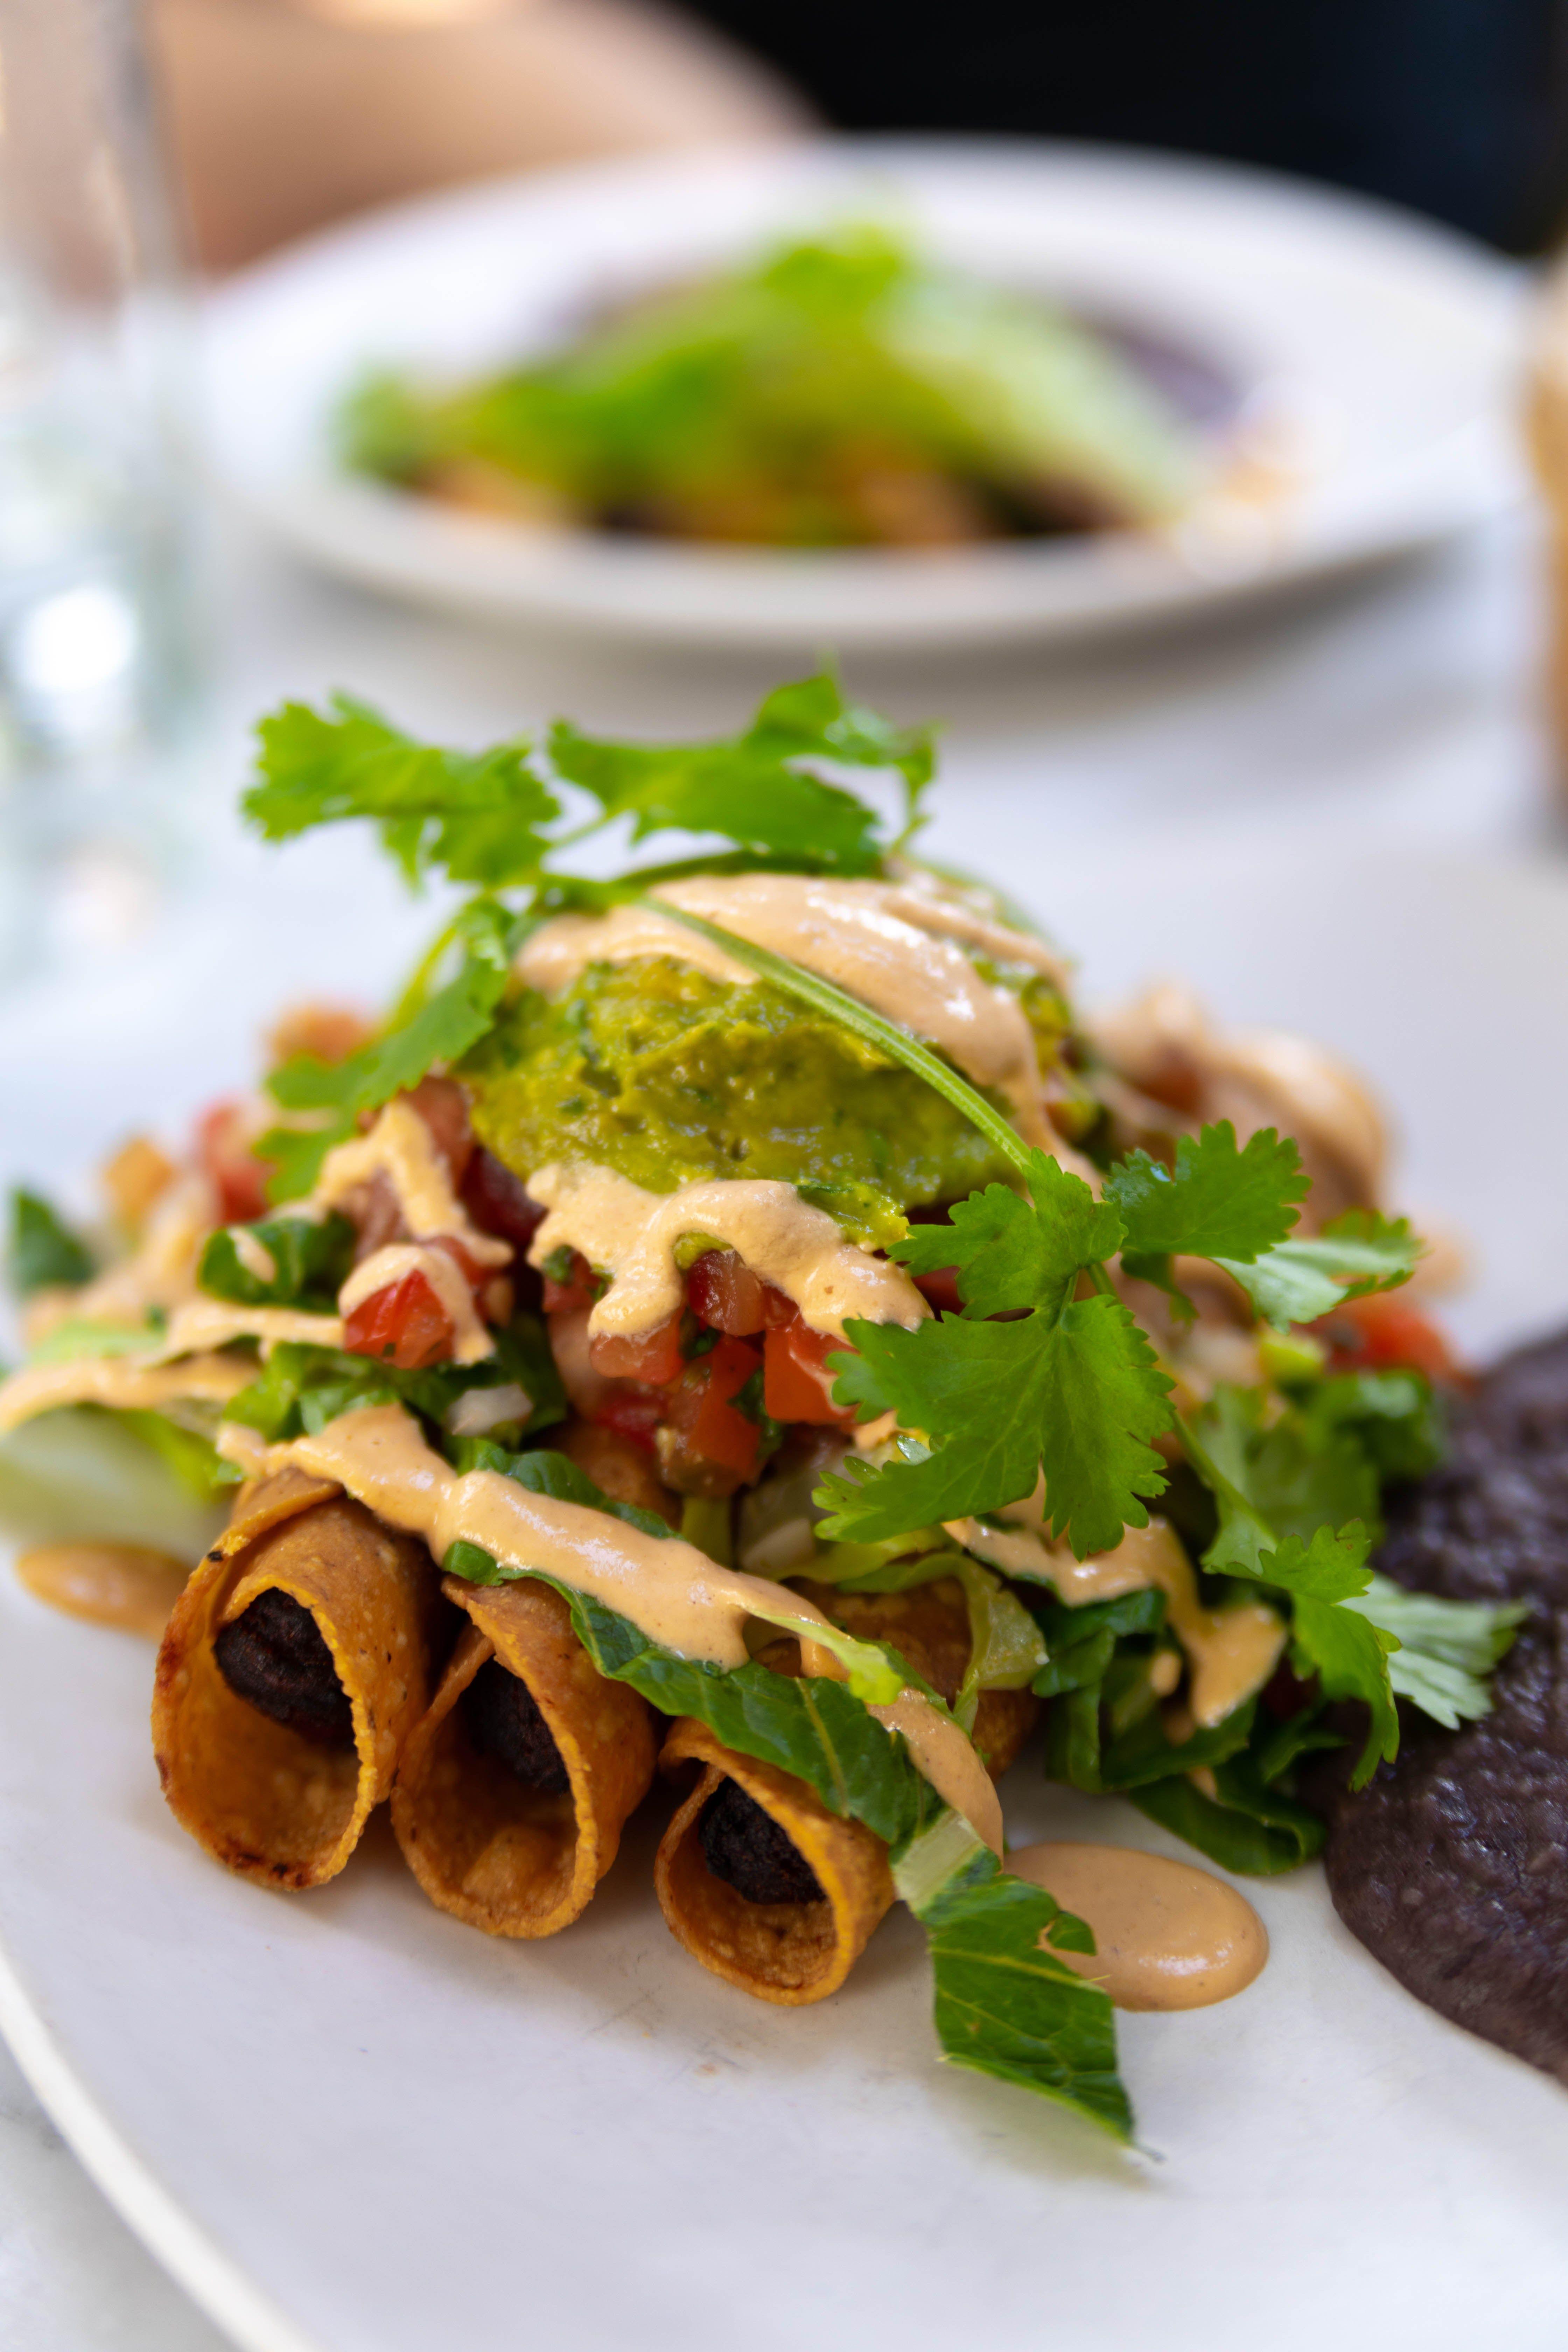 Luxury restaurants of the world gracias madre vegan